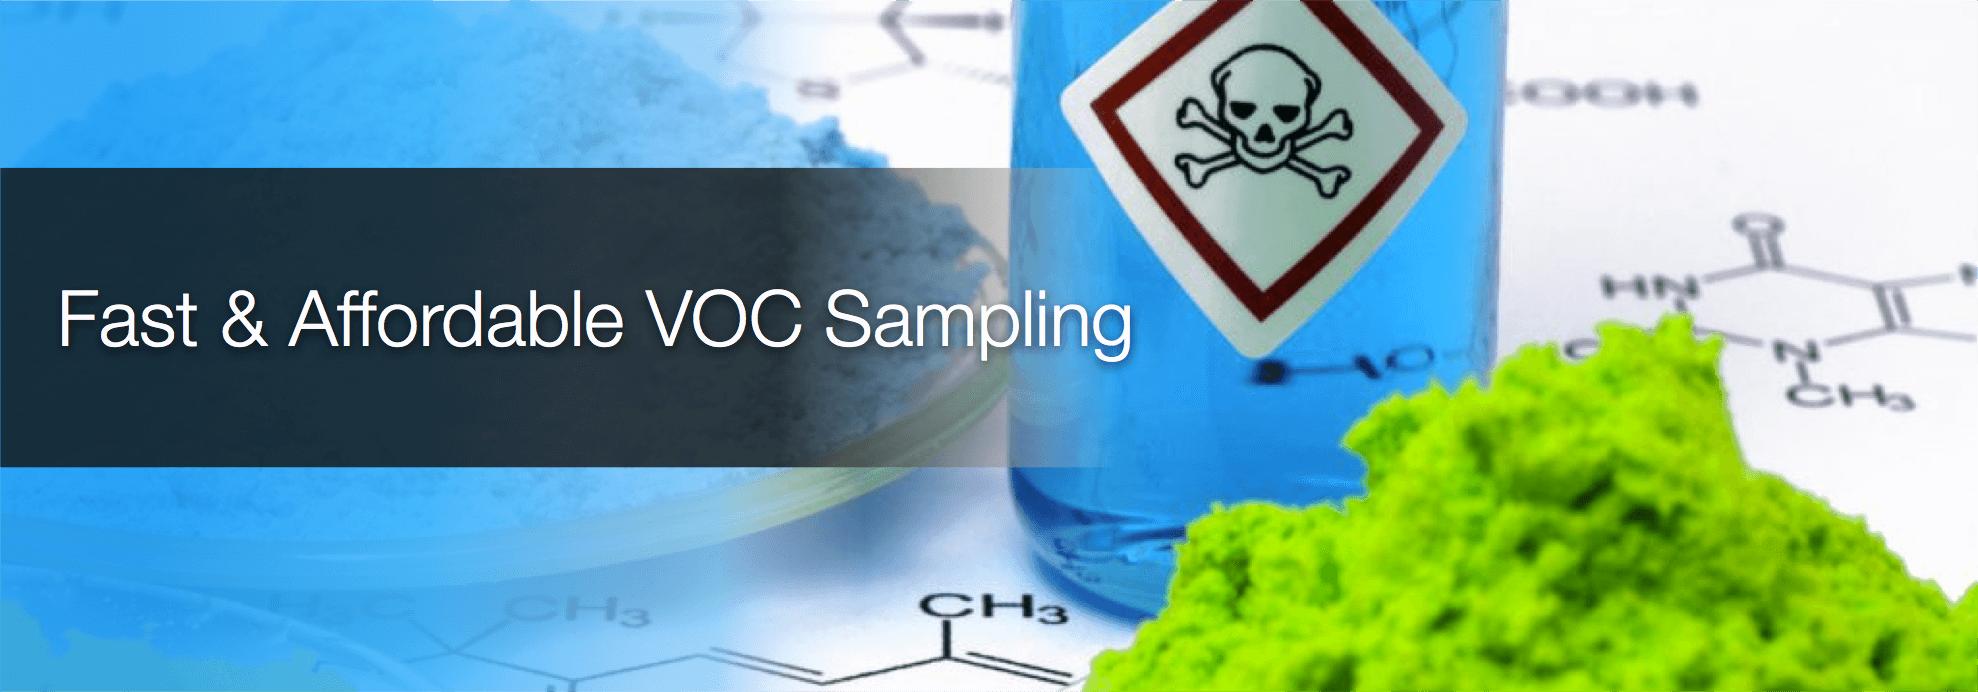 VOC Testing Company in Phoenix AZ